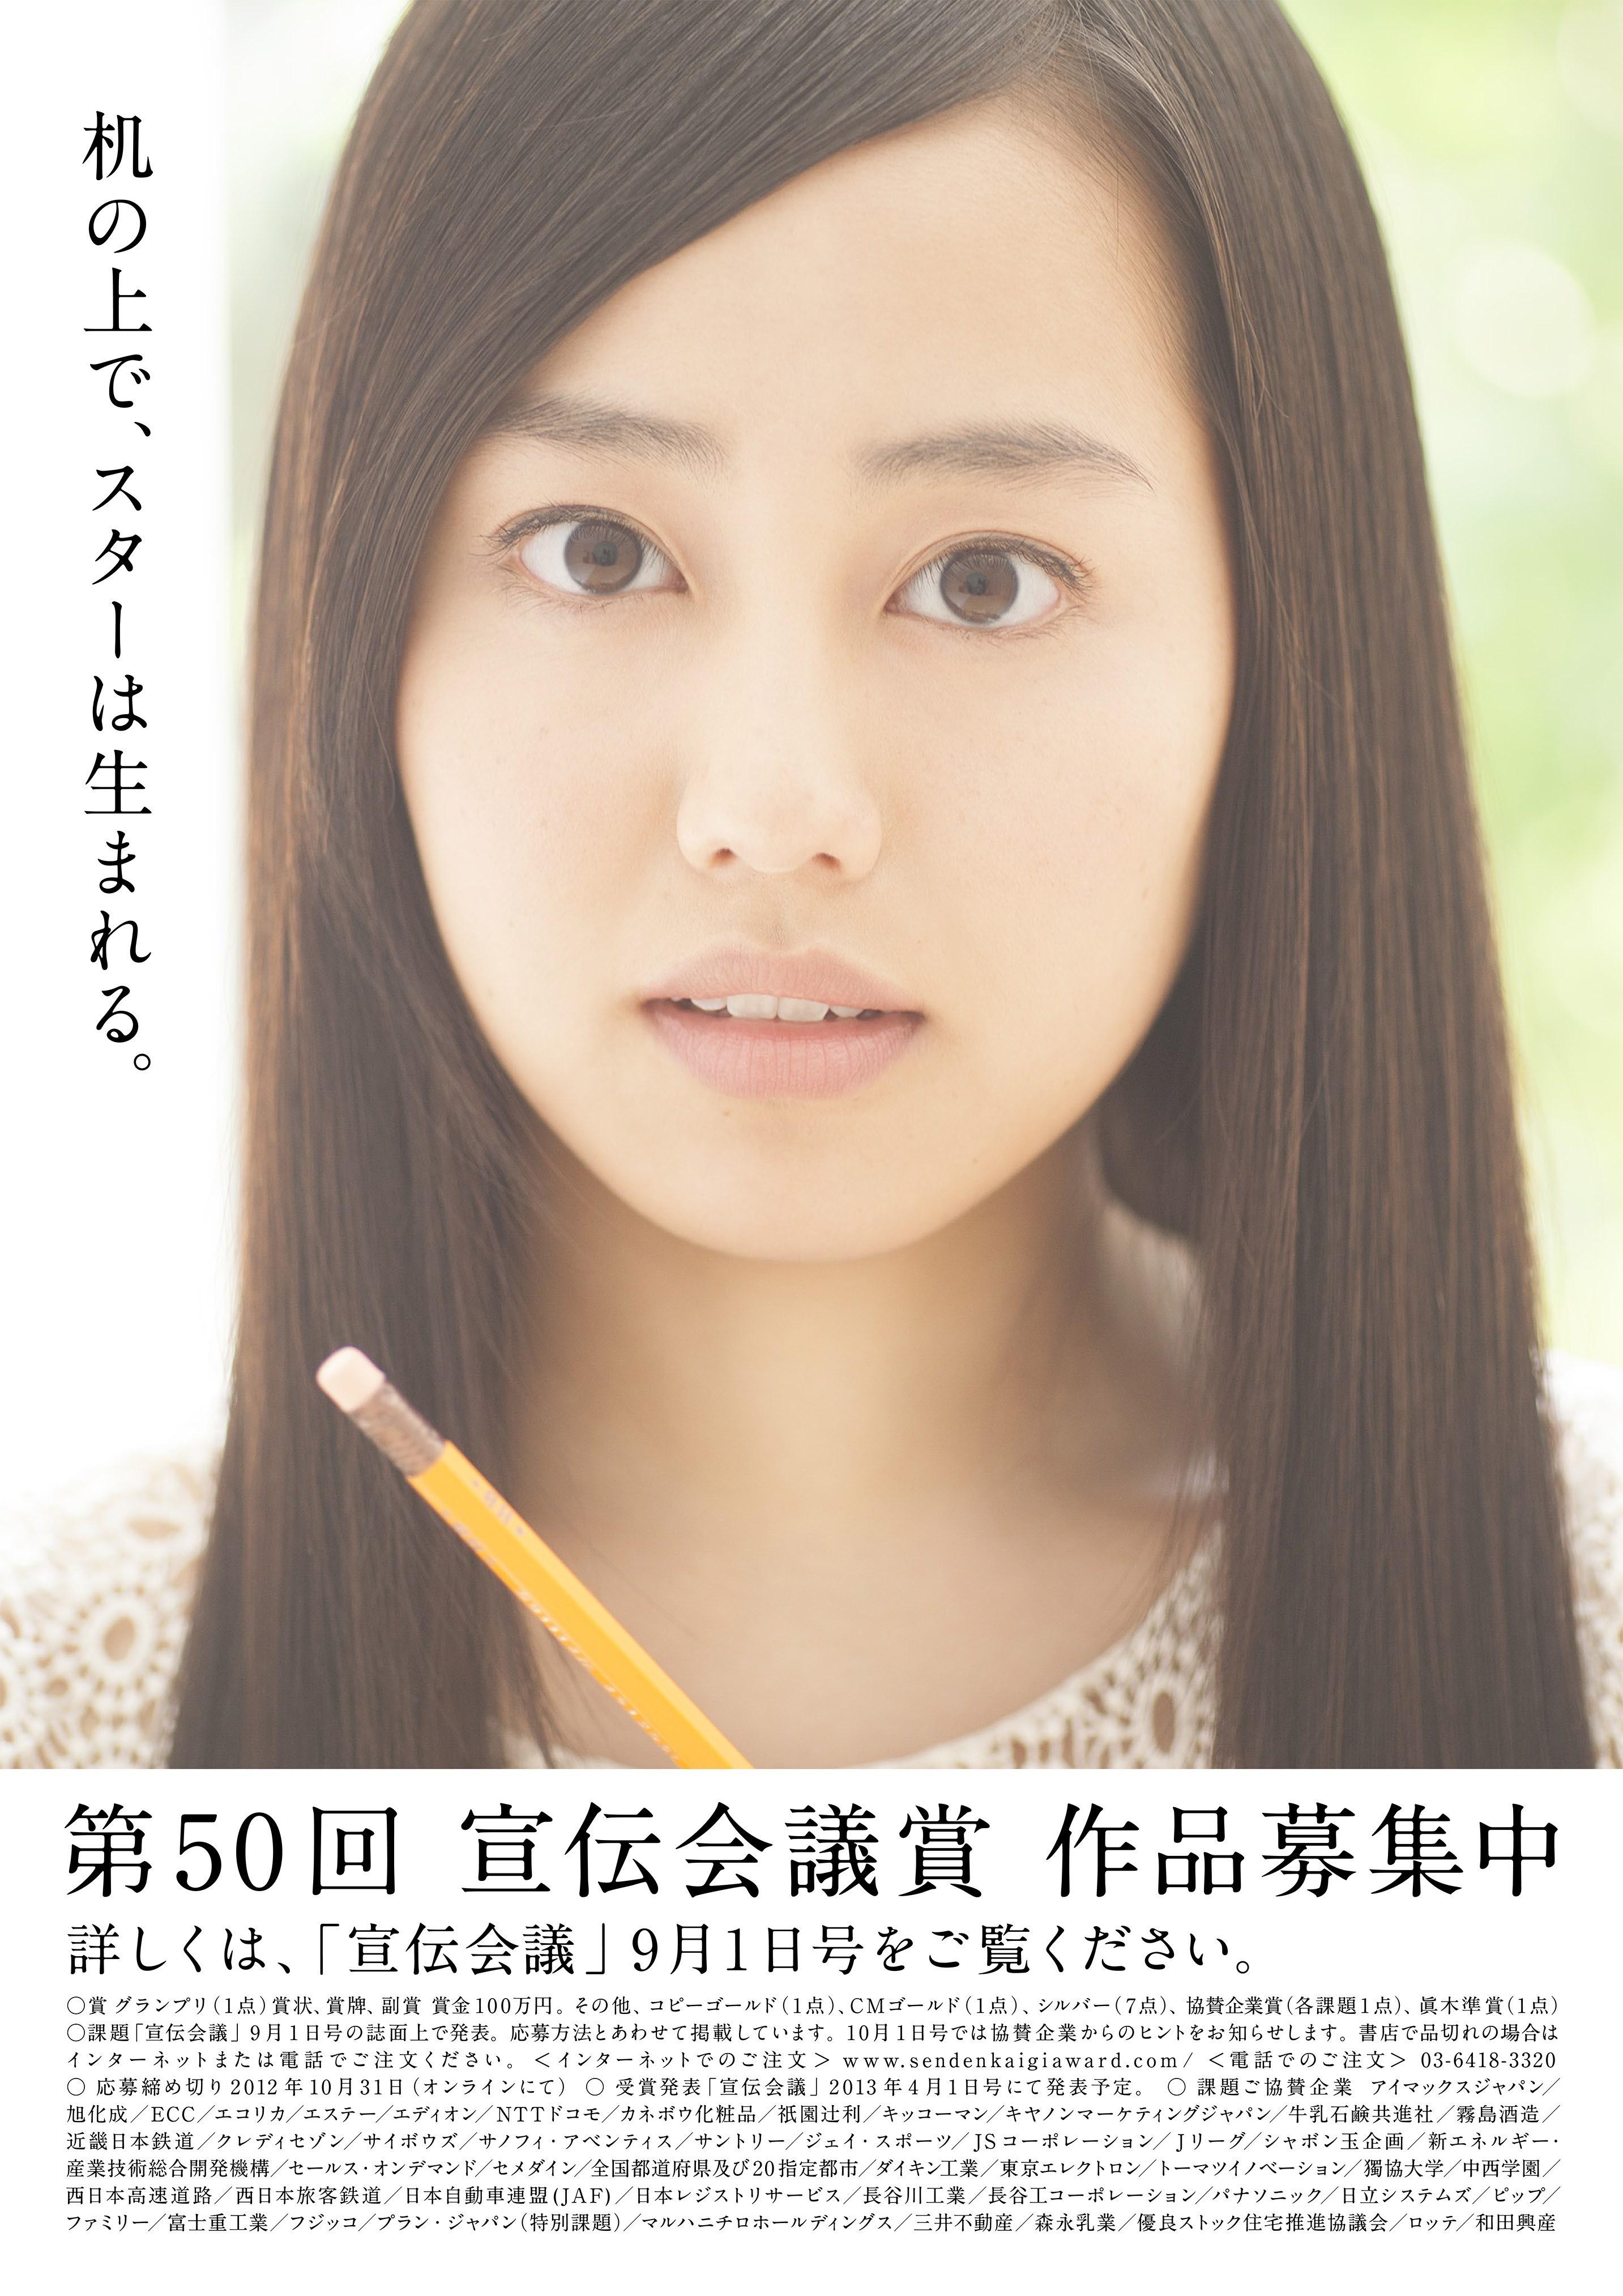 P0643_宣伝会議_宣伝会議賞ポスター